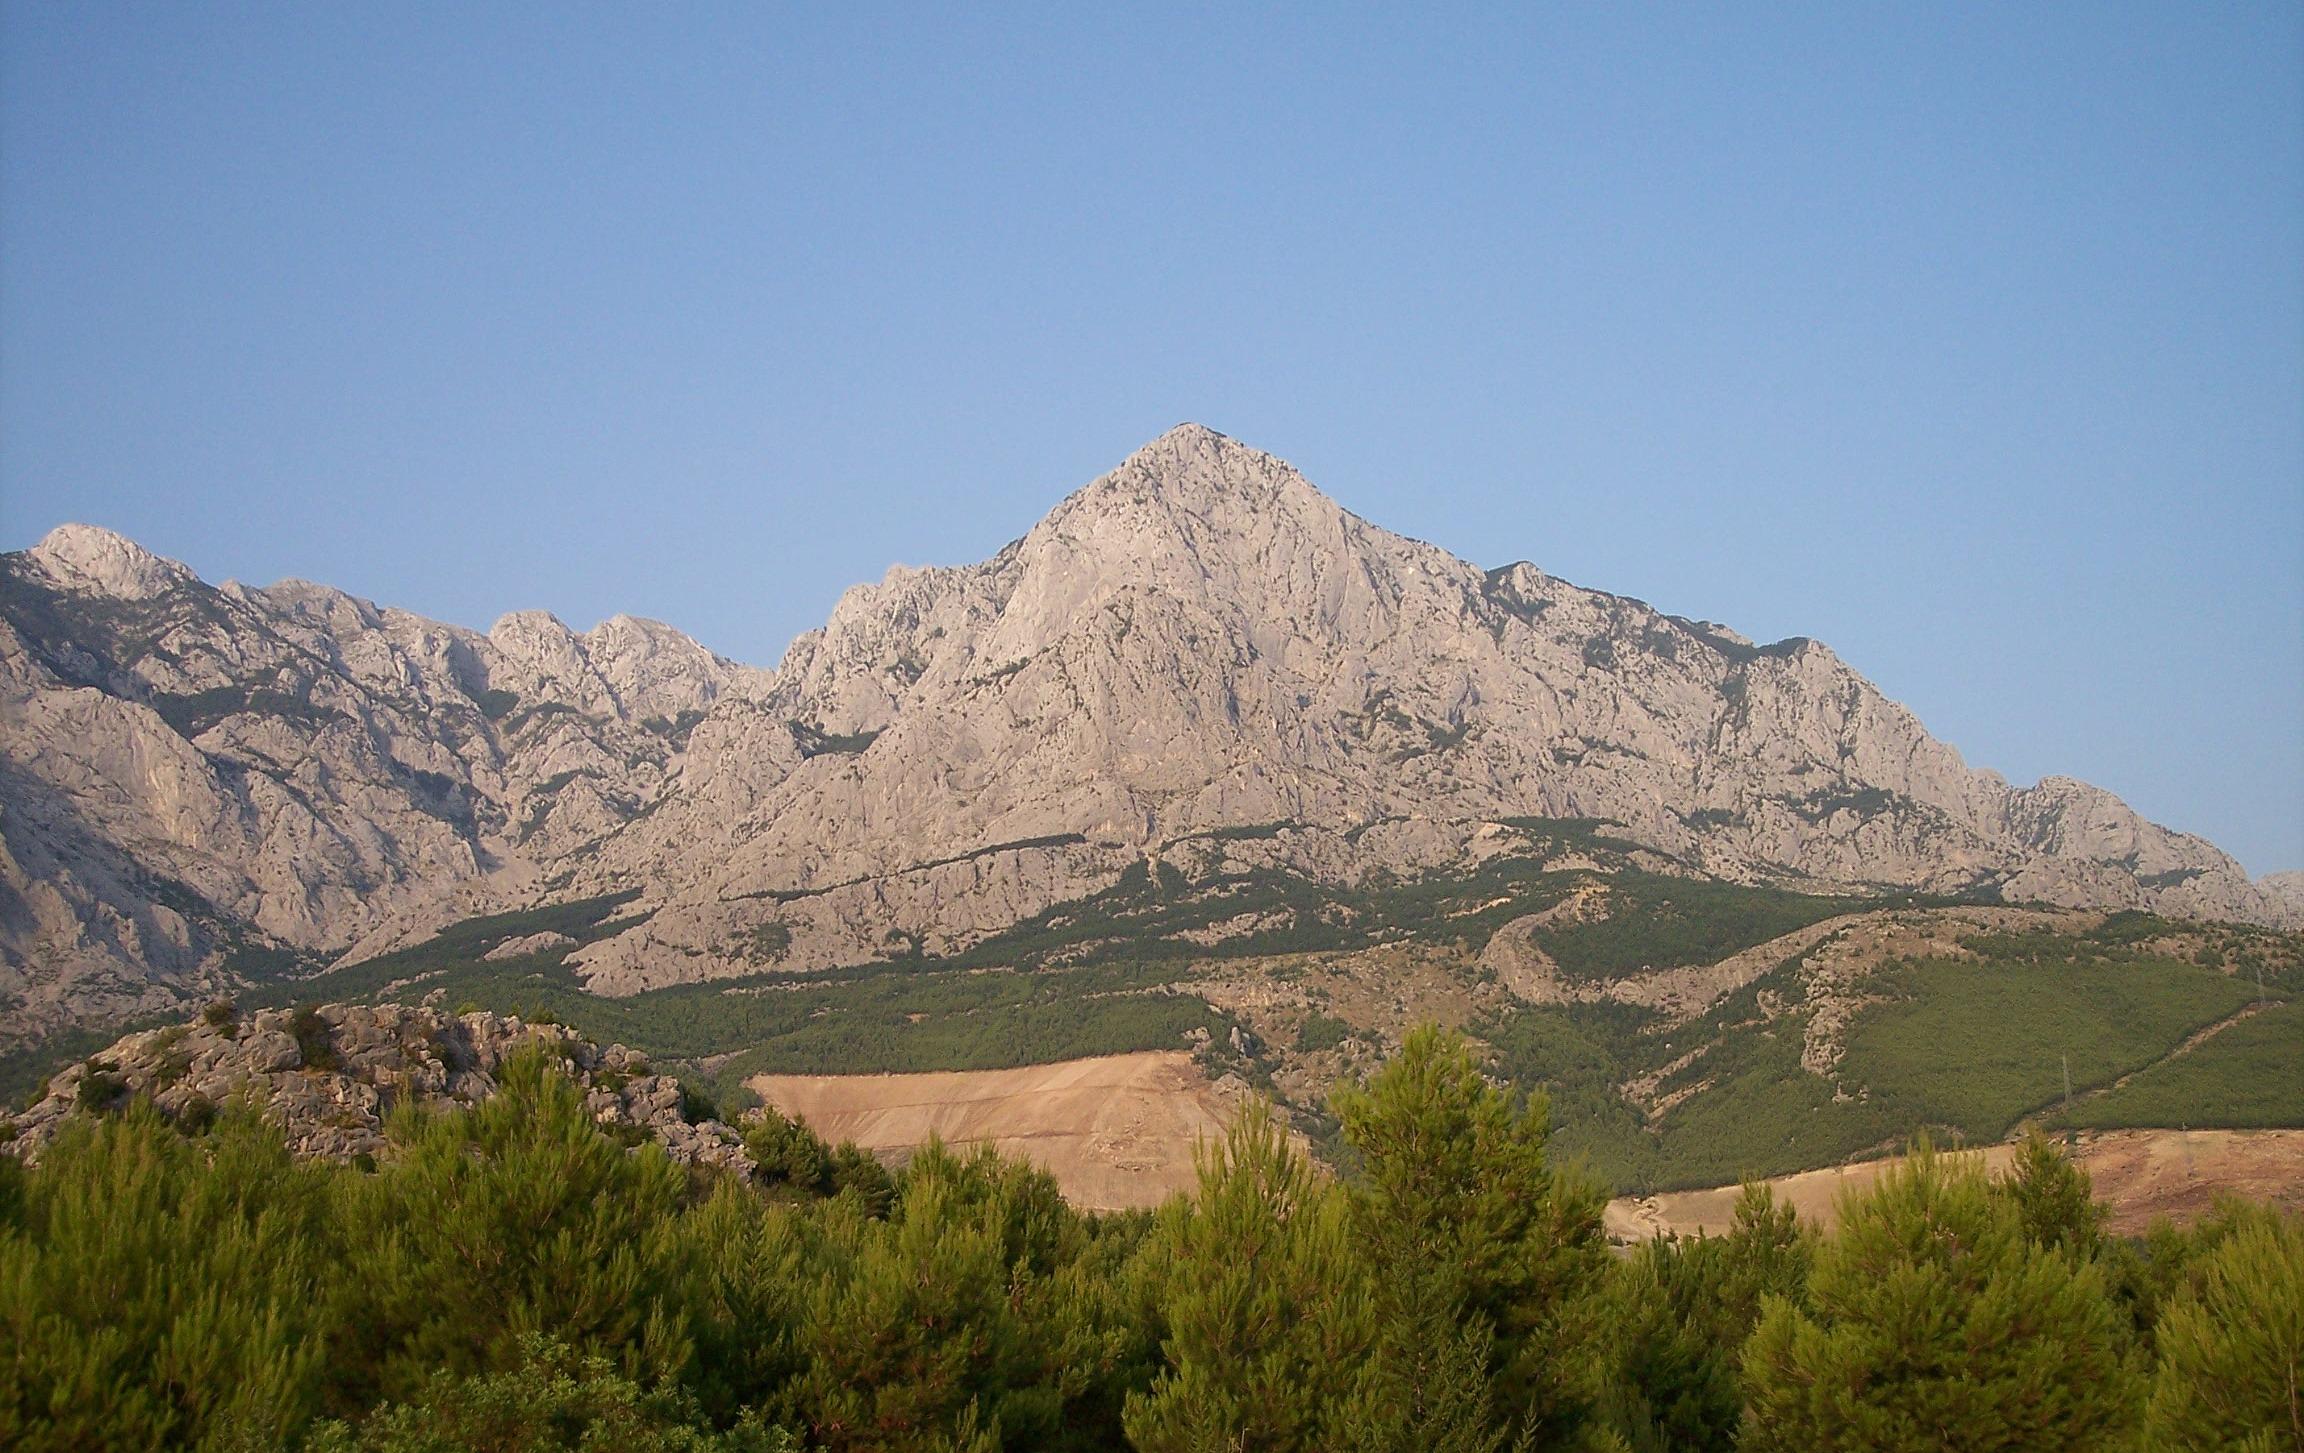 Image of Baska_Voda-mountain.jpg#: http://commons.wikimedia.org/wiki/Special:FilePath/Baska_Voda-mountain.jpg